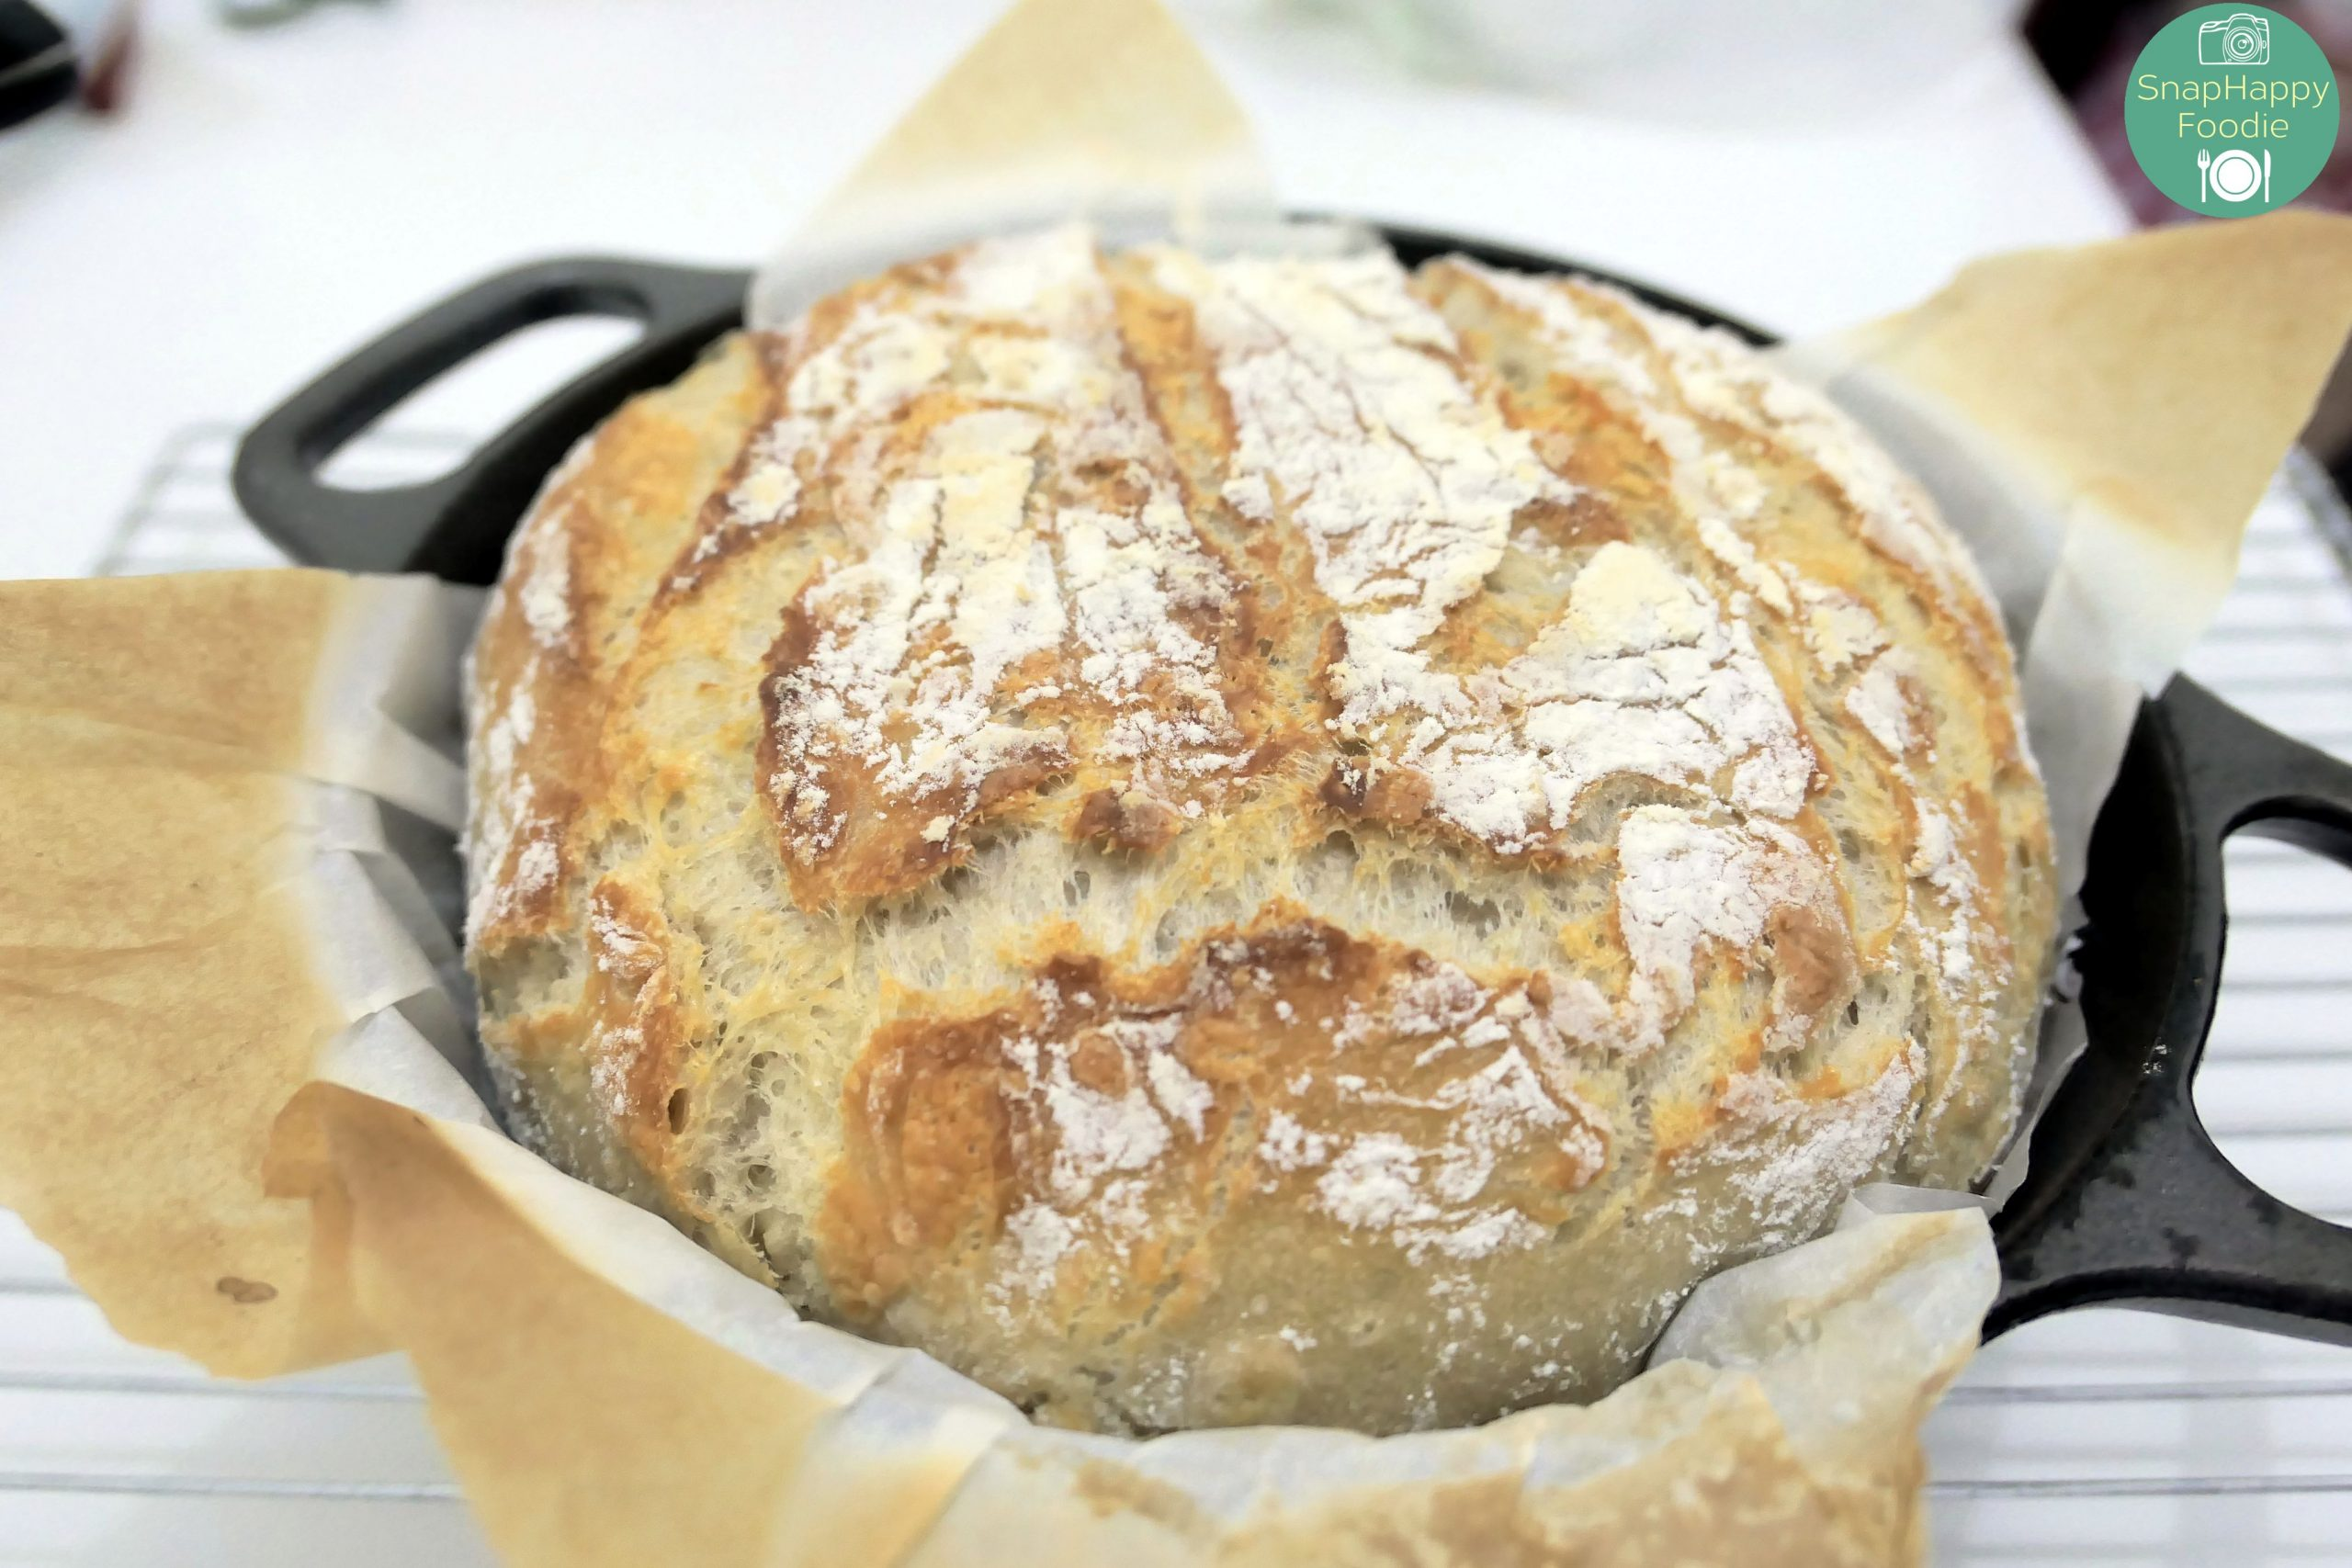 SnapHappy Foodie | www.snaphappyfoodie.com